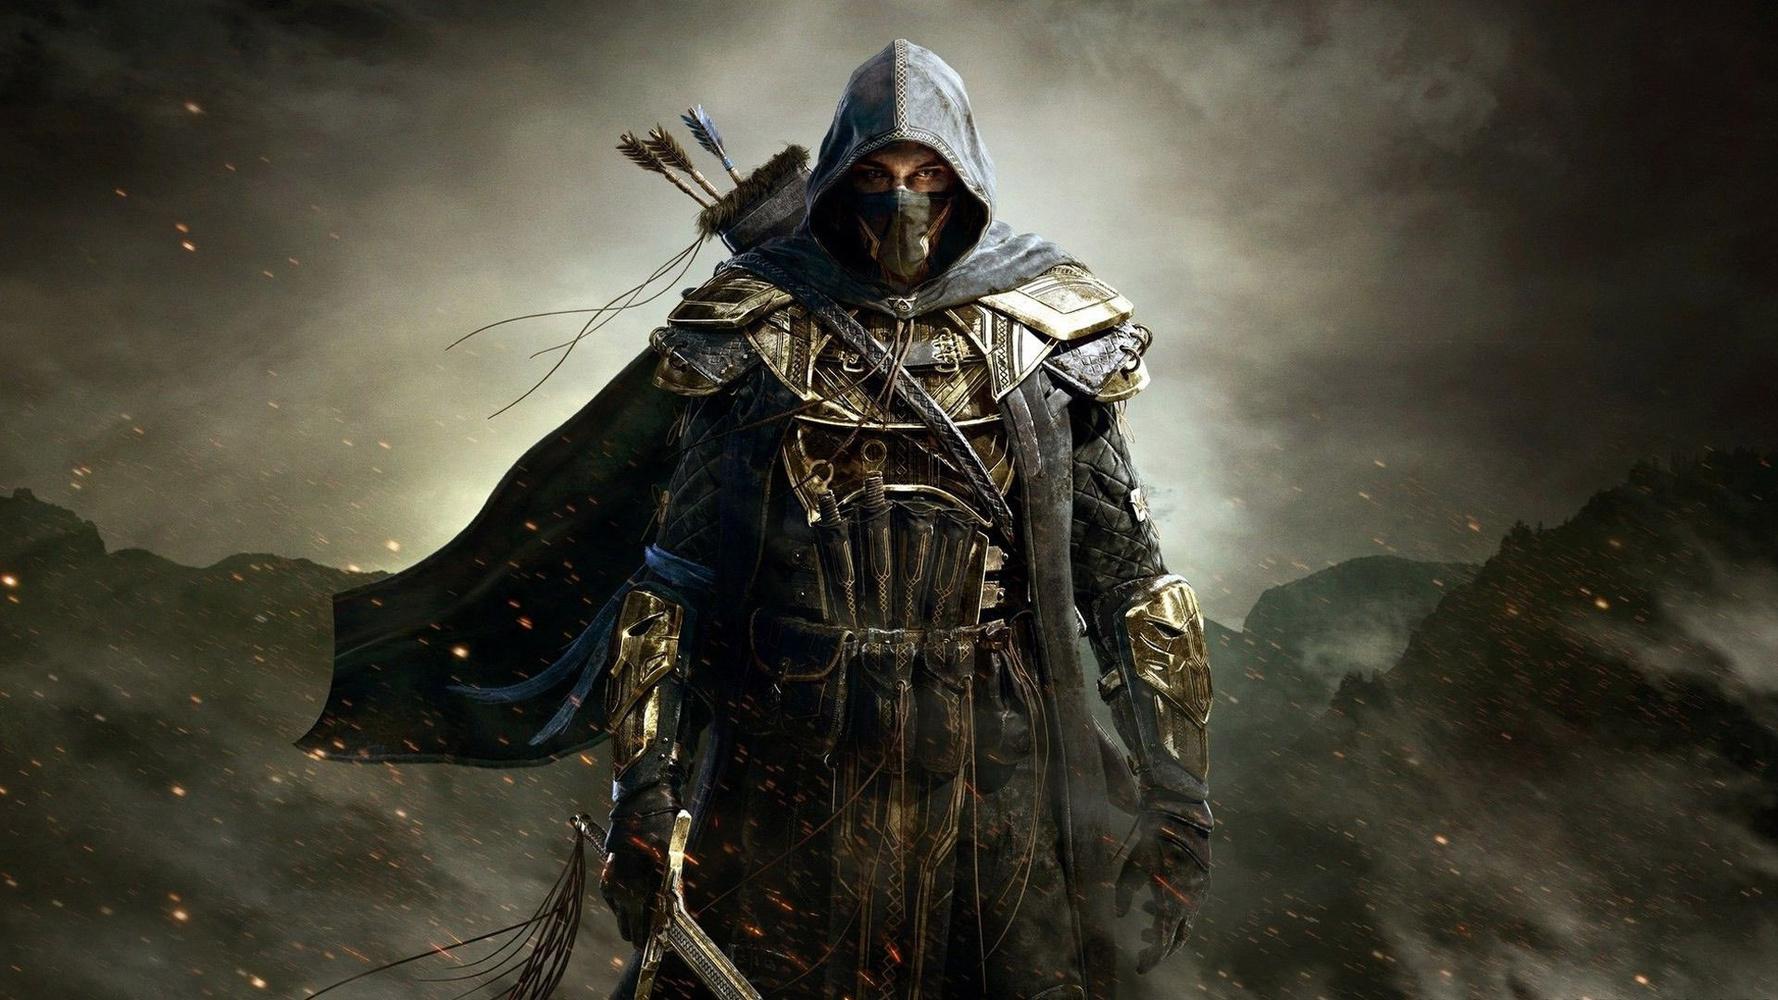 the_elder_scrolls_online_pre-order_0004-pc-games.jpg